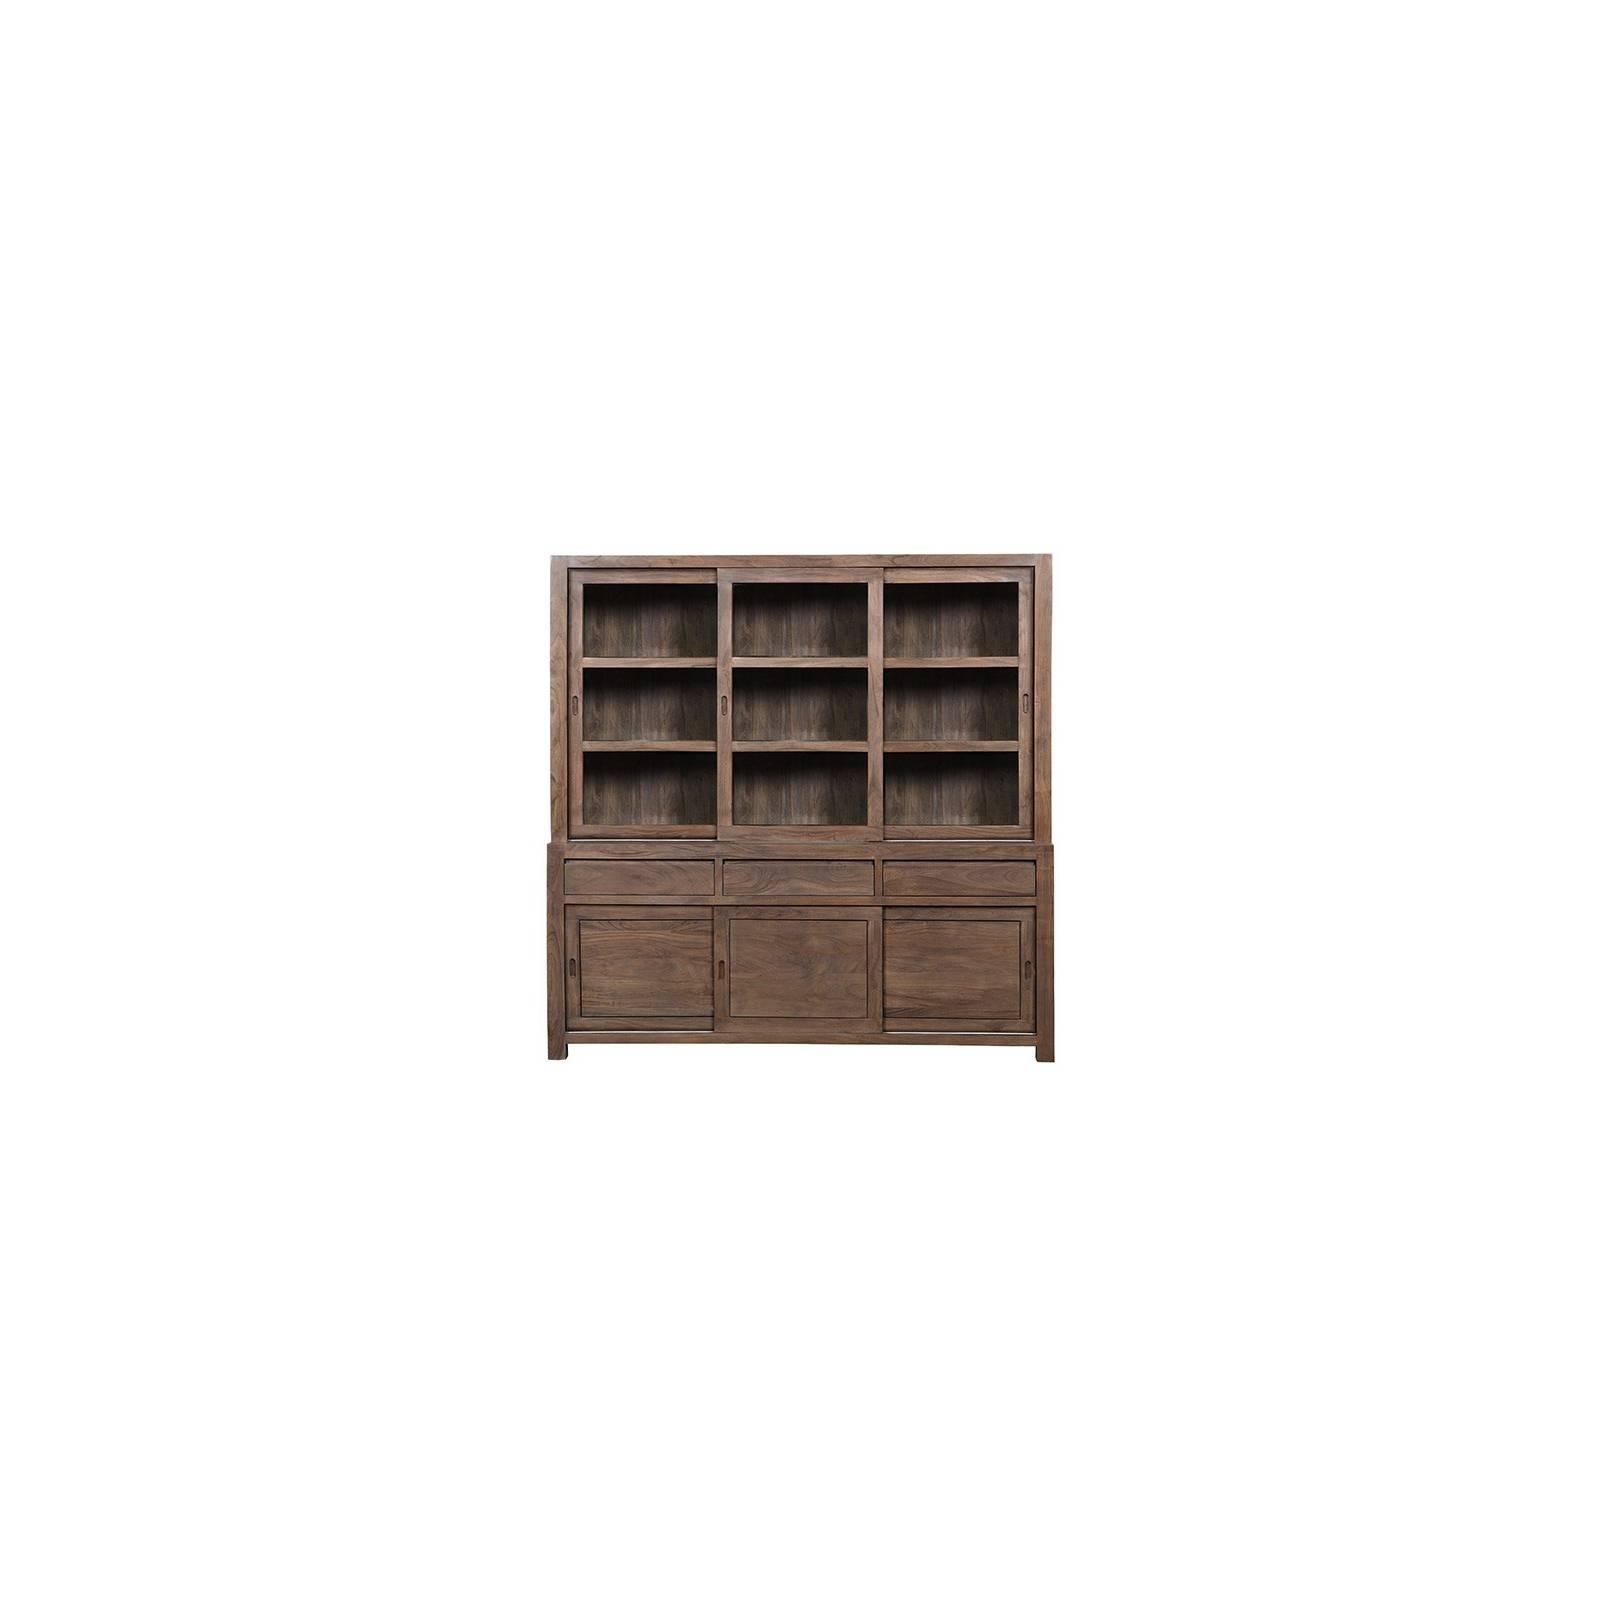 Buffet Vaisselier Tara Grisée Acacia - meuble design haut de gamme